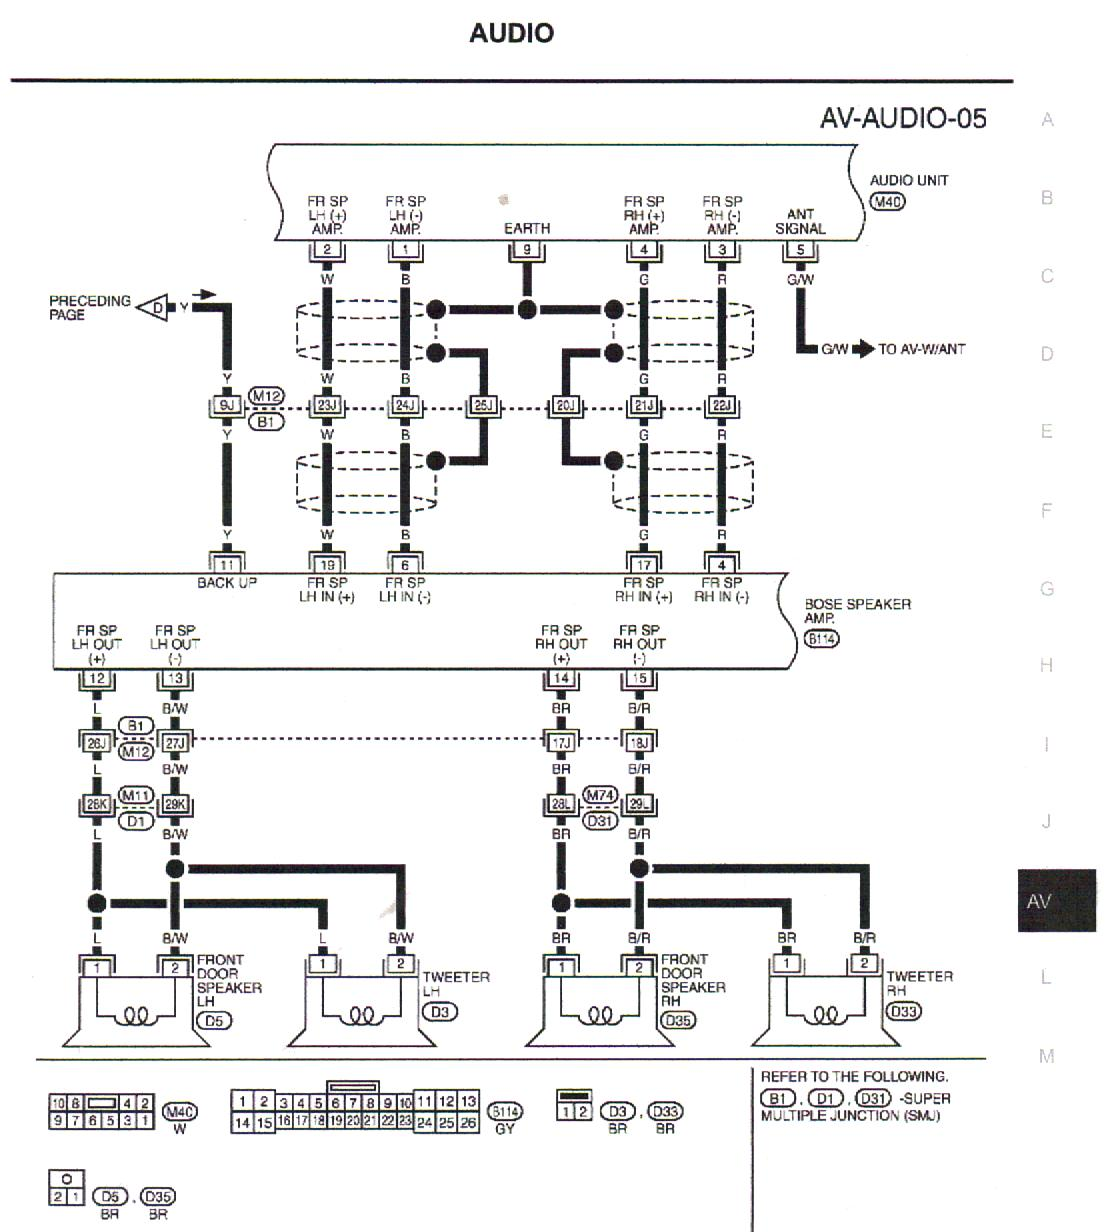 Infiniti Bose Amp Wiring Diagrams Diagram Libraries 3 G35 Fuse Box Qx56 Speaker Third Level2008 Library